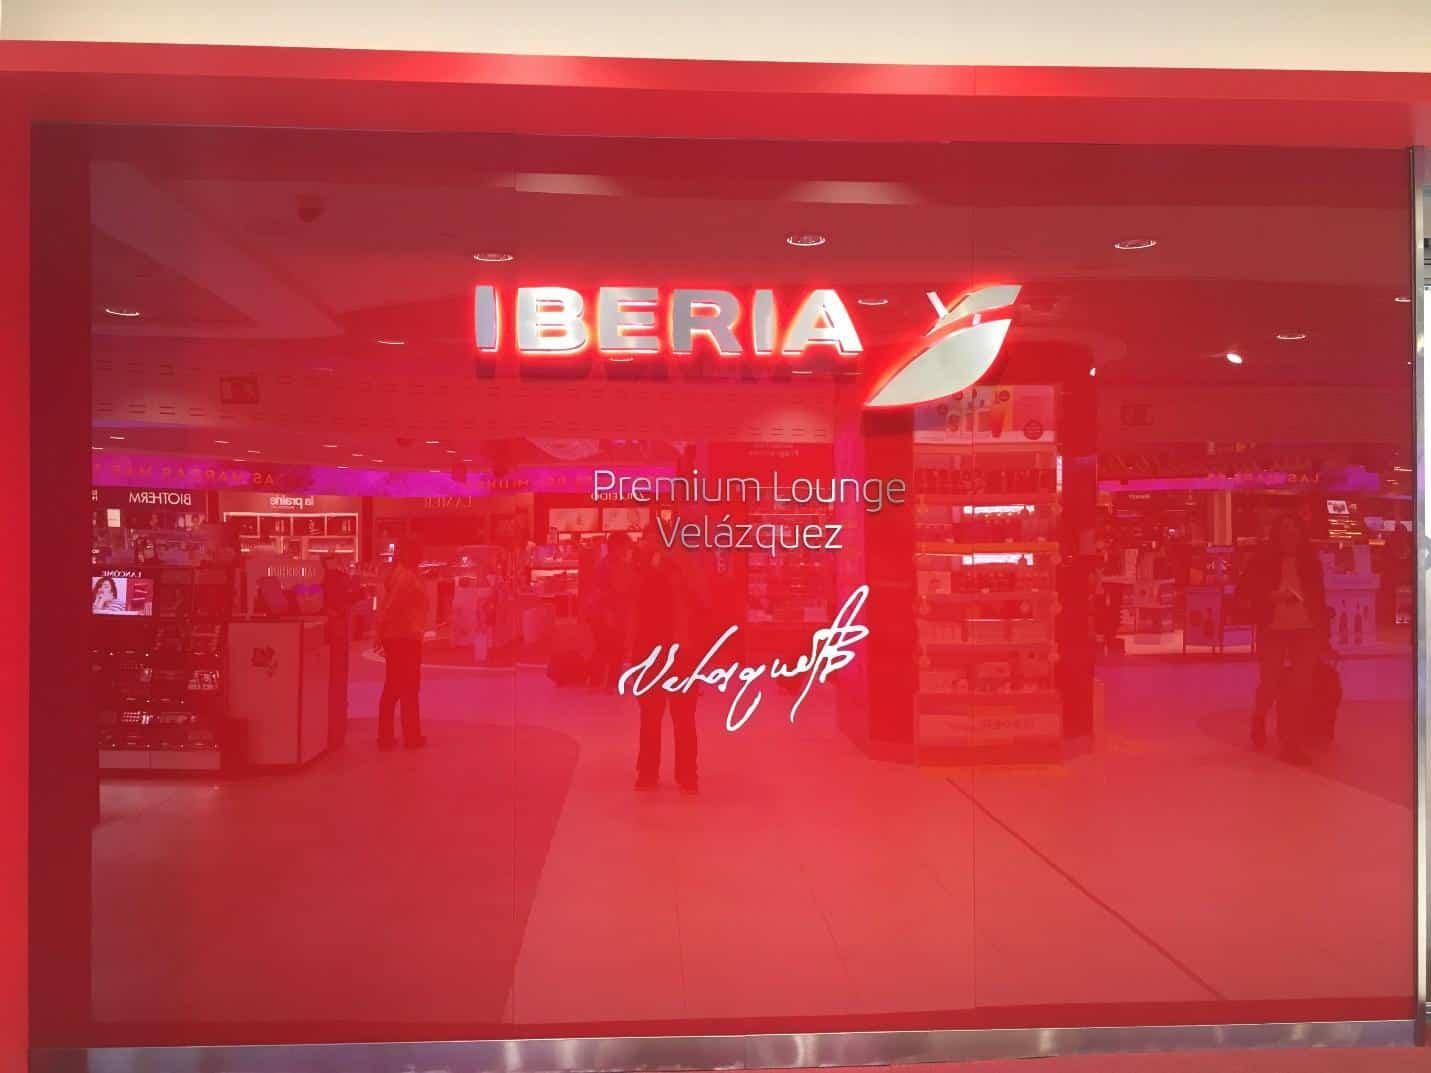 Iberia Velazquez Lounge